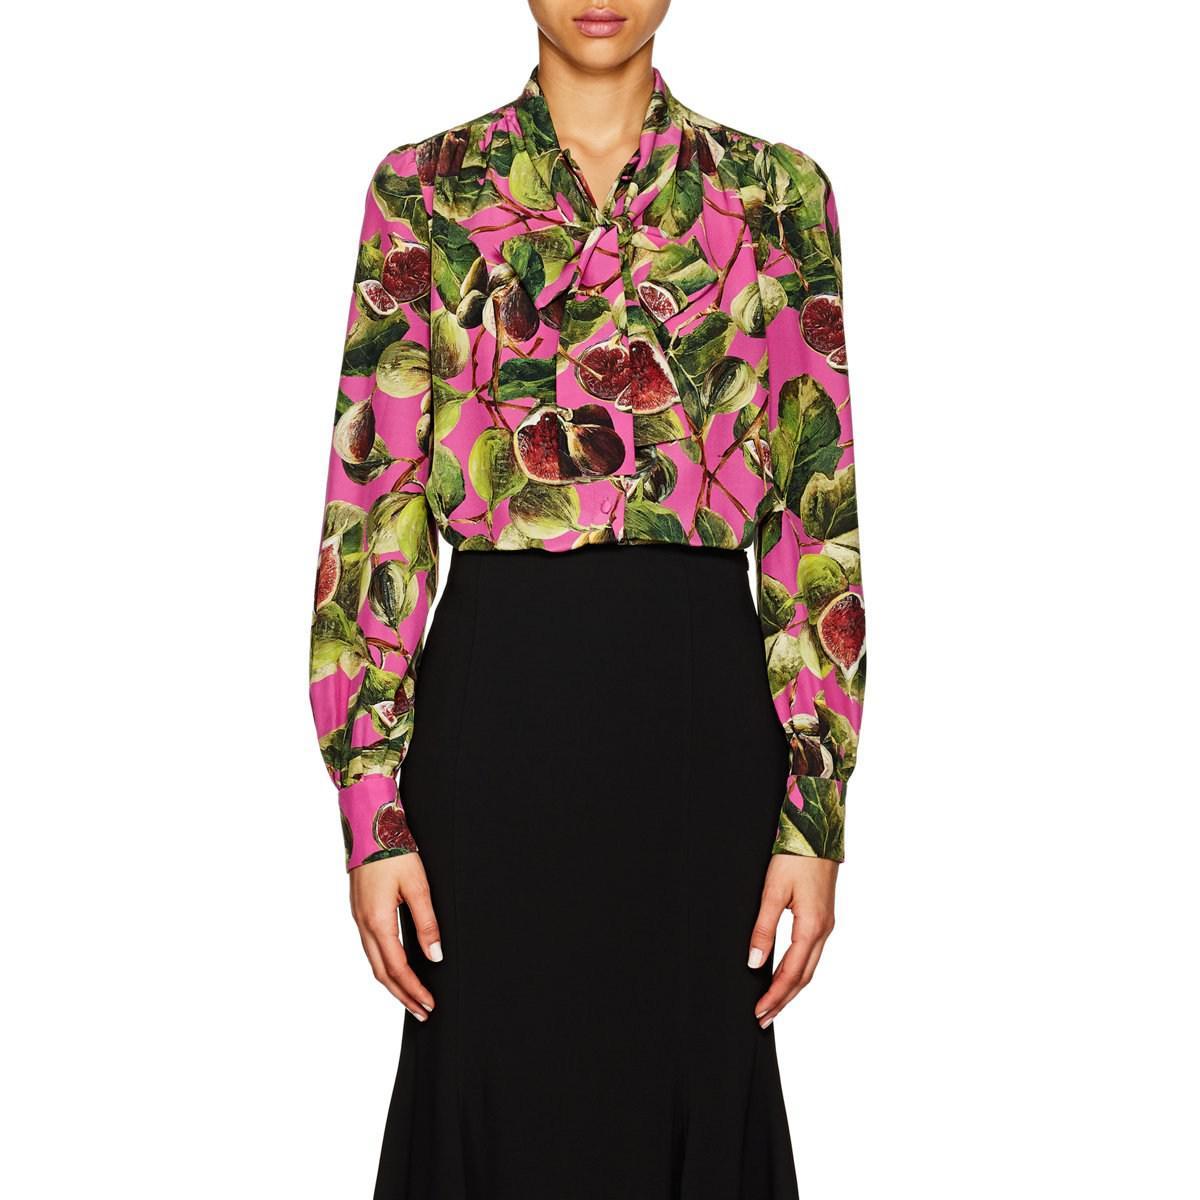 afe9a6b2157248 ... cheap dolce gabbana. womens pink fig print silk tieneck blouse ad908  8ddab ...